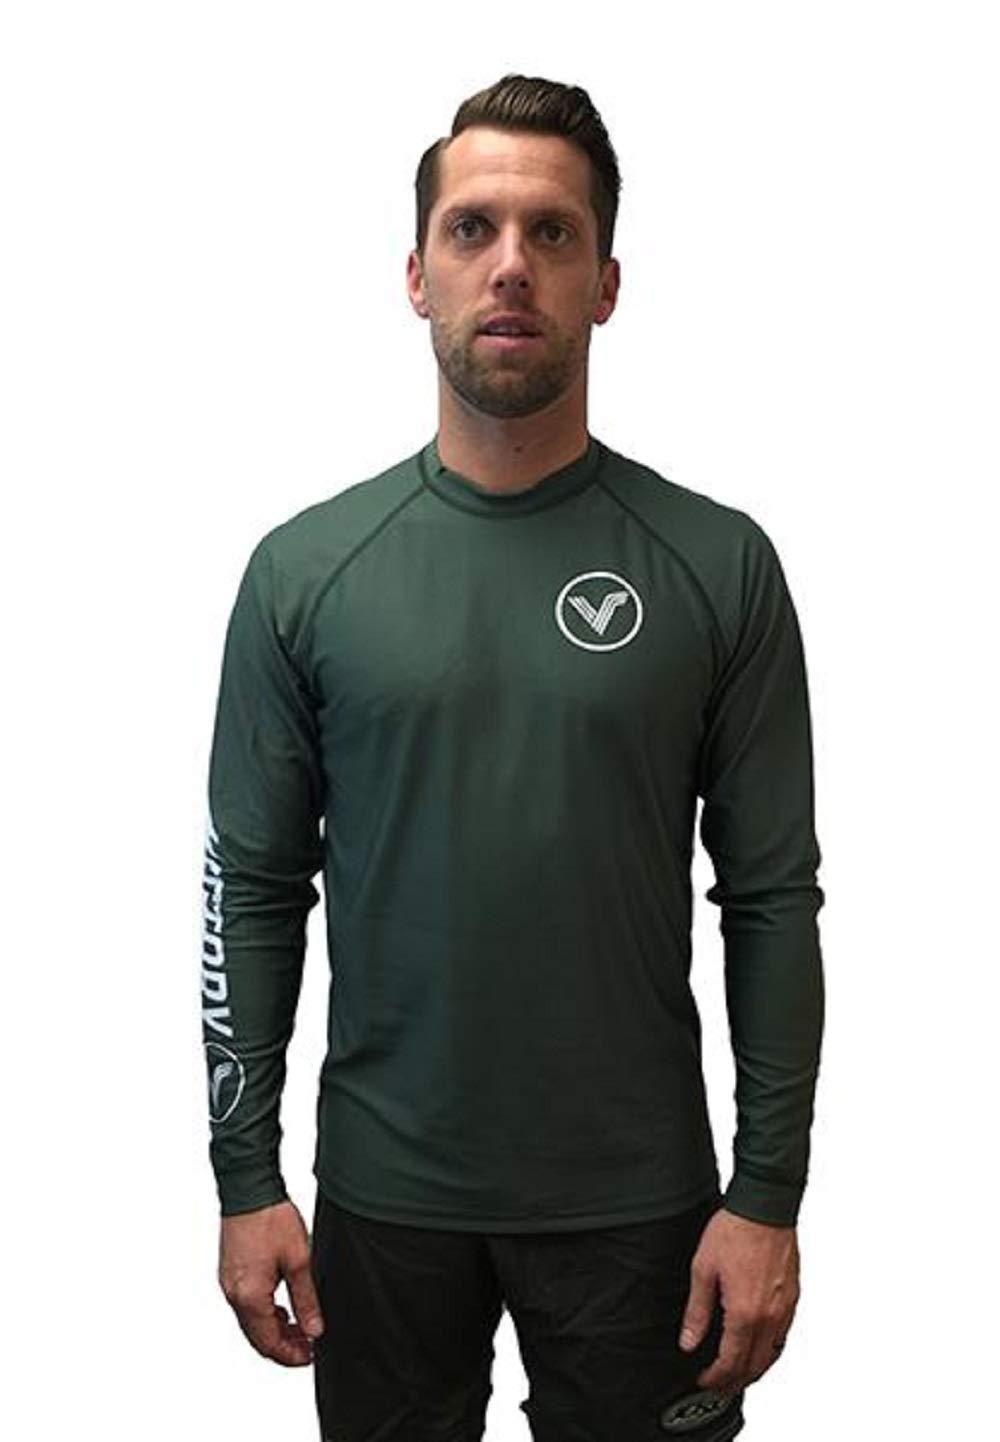 KoreDry Victory Men's Long Sleeve T-Shirt - Water-Resistant UPF 50+ Sun Protection/Block, Medium, Dark Green